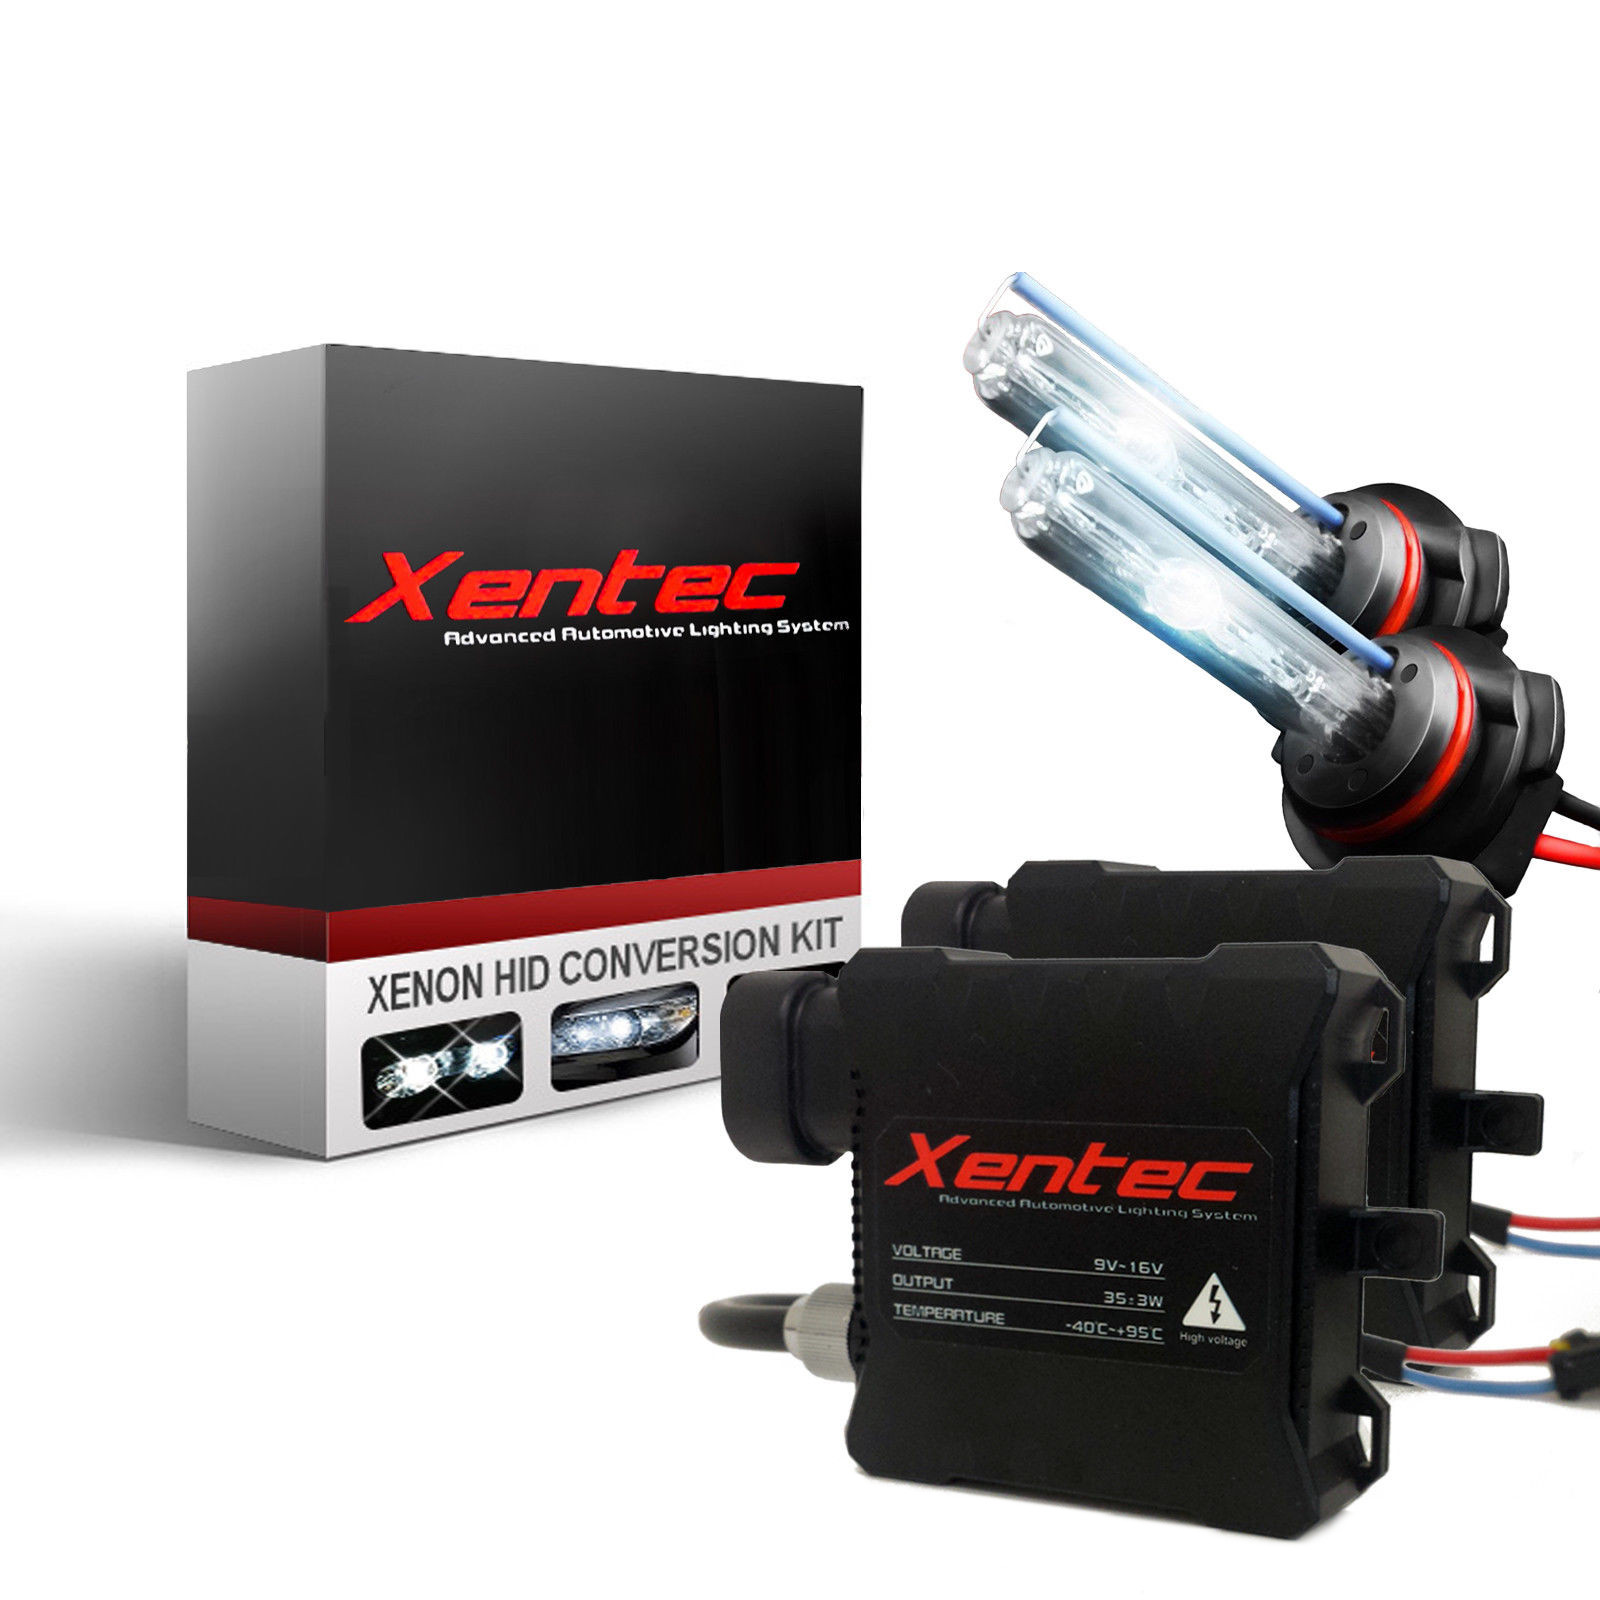 Xentec 6000K Xenon HID Kit for Toyota Yaris 2006-2017 Headlight 9003 H4 Super Slim Digital HID Conversion Lights